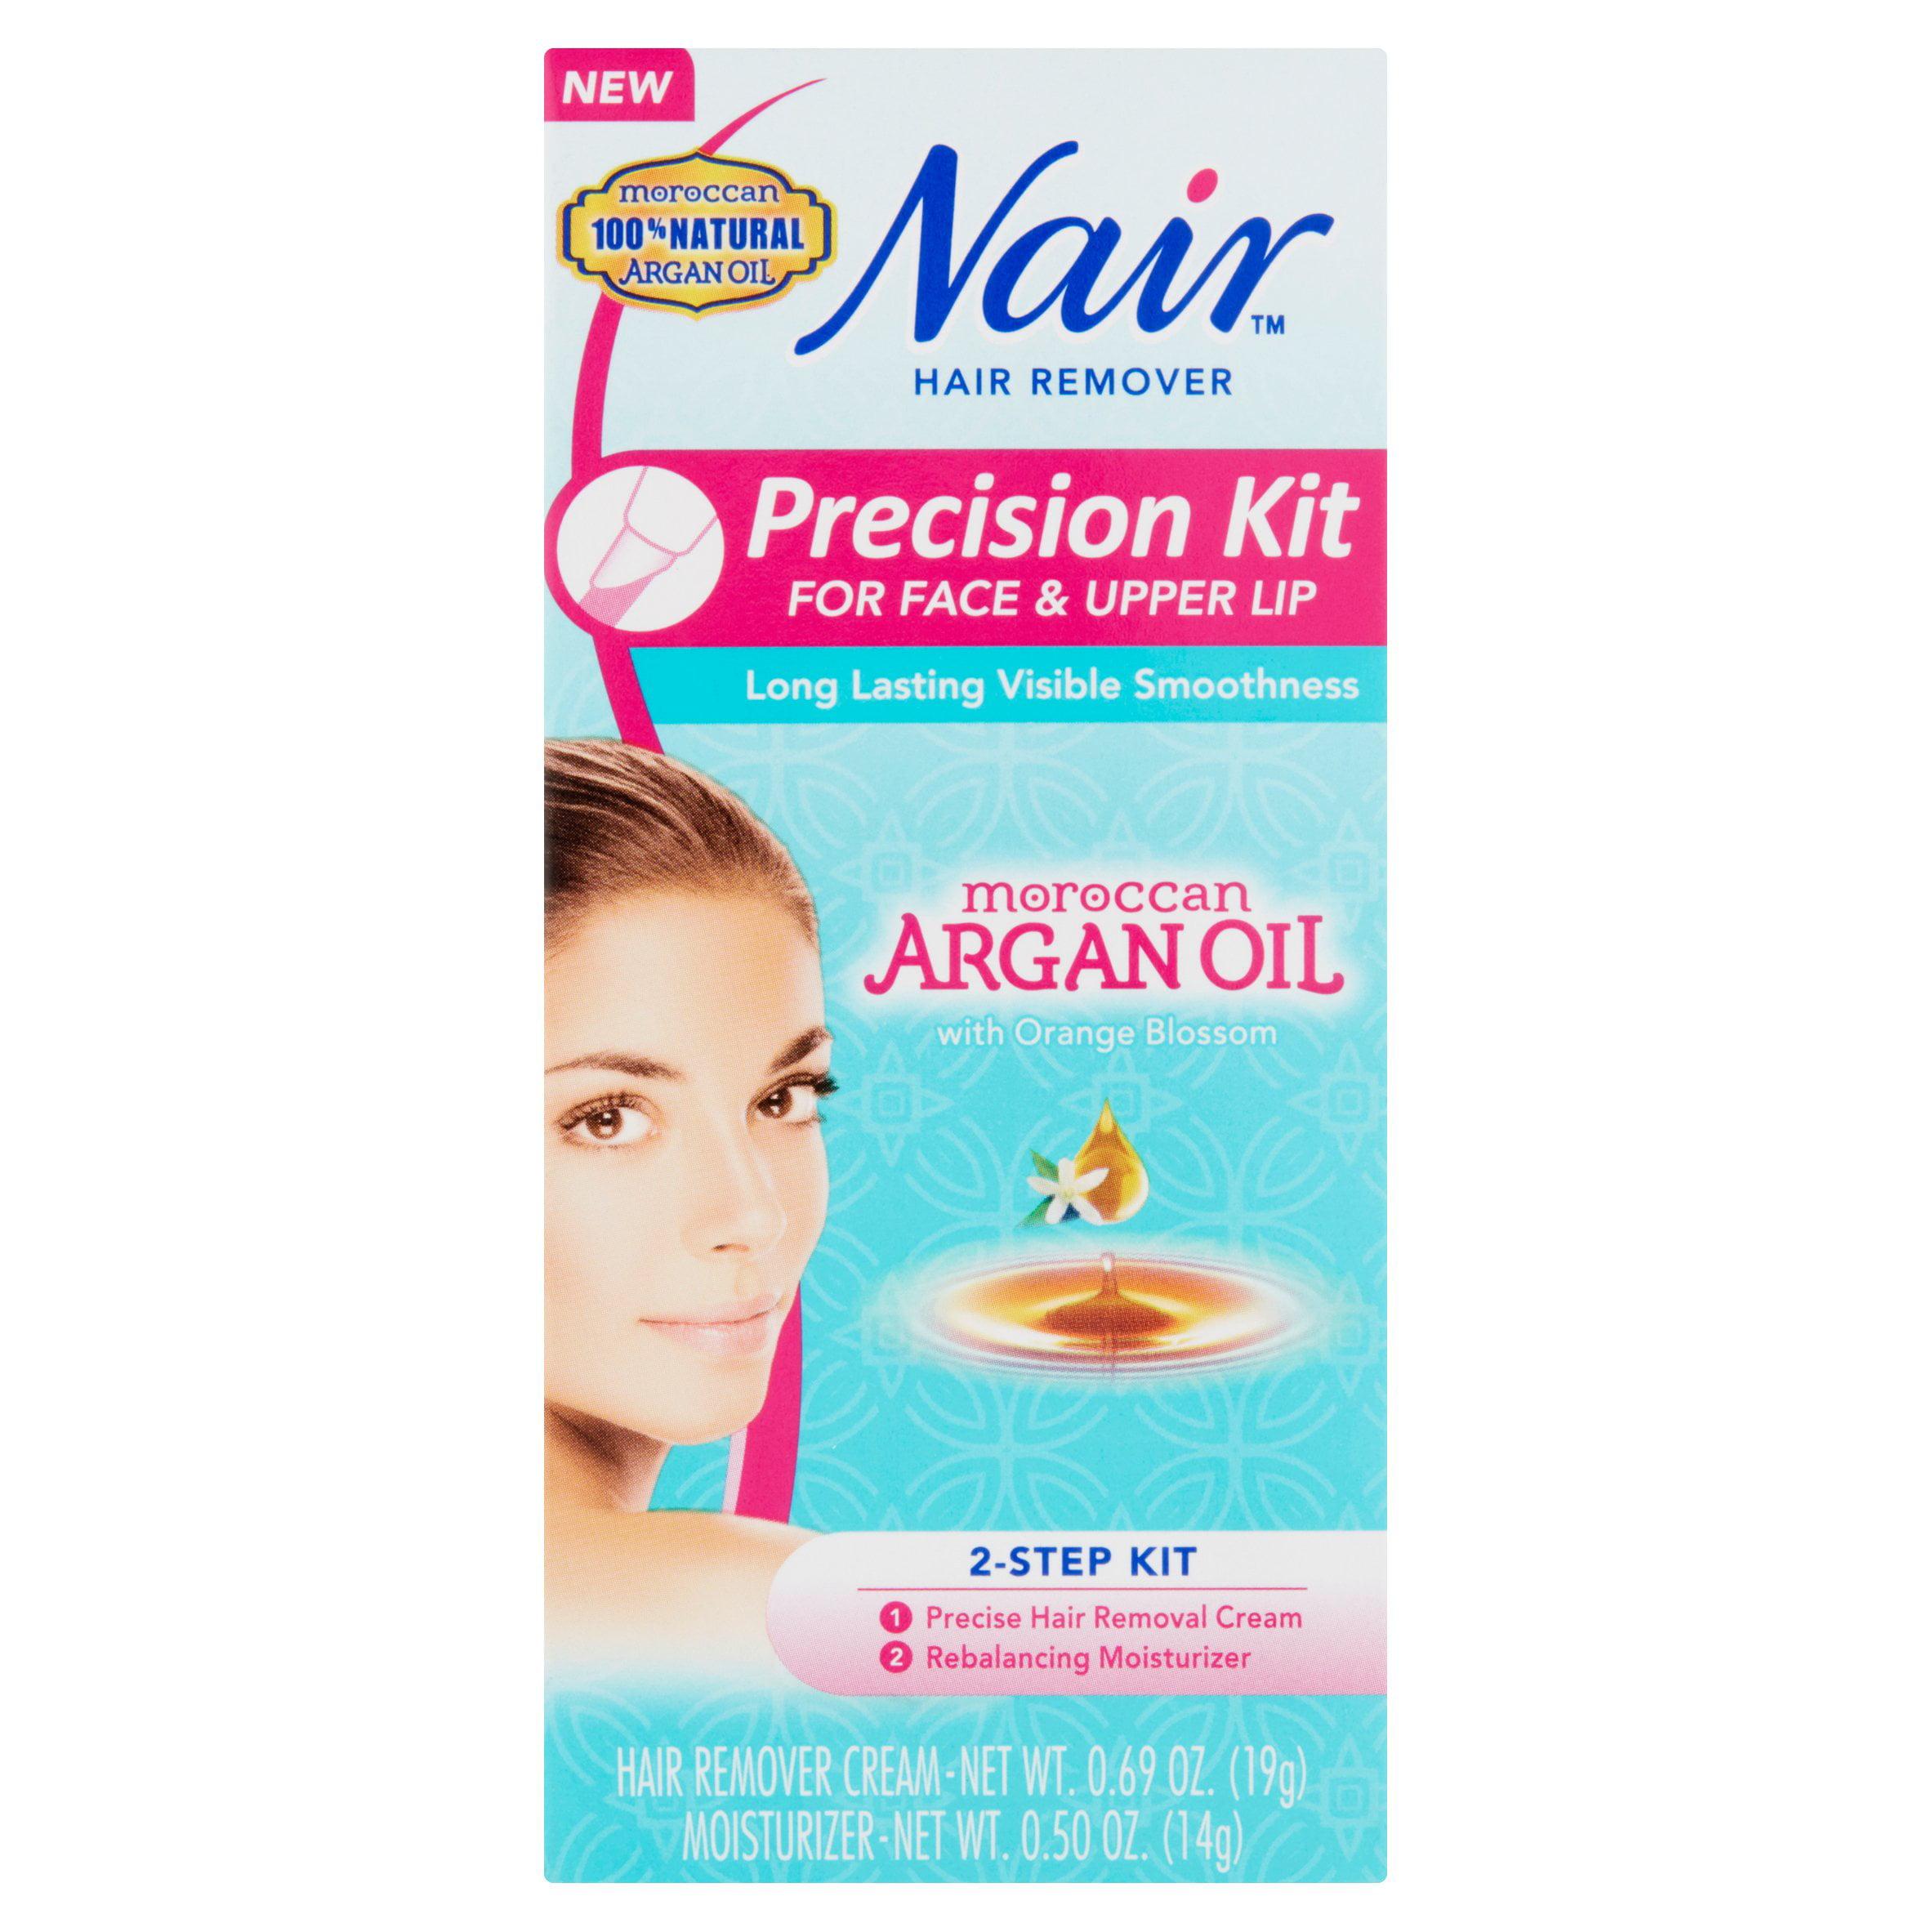 Nair Precision Kit For Face Upper Lip Hair Remover Walmart Com